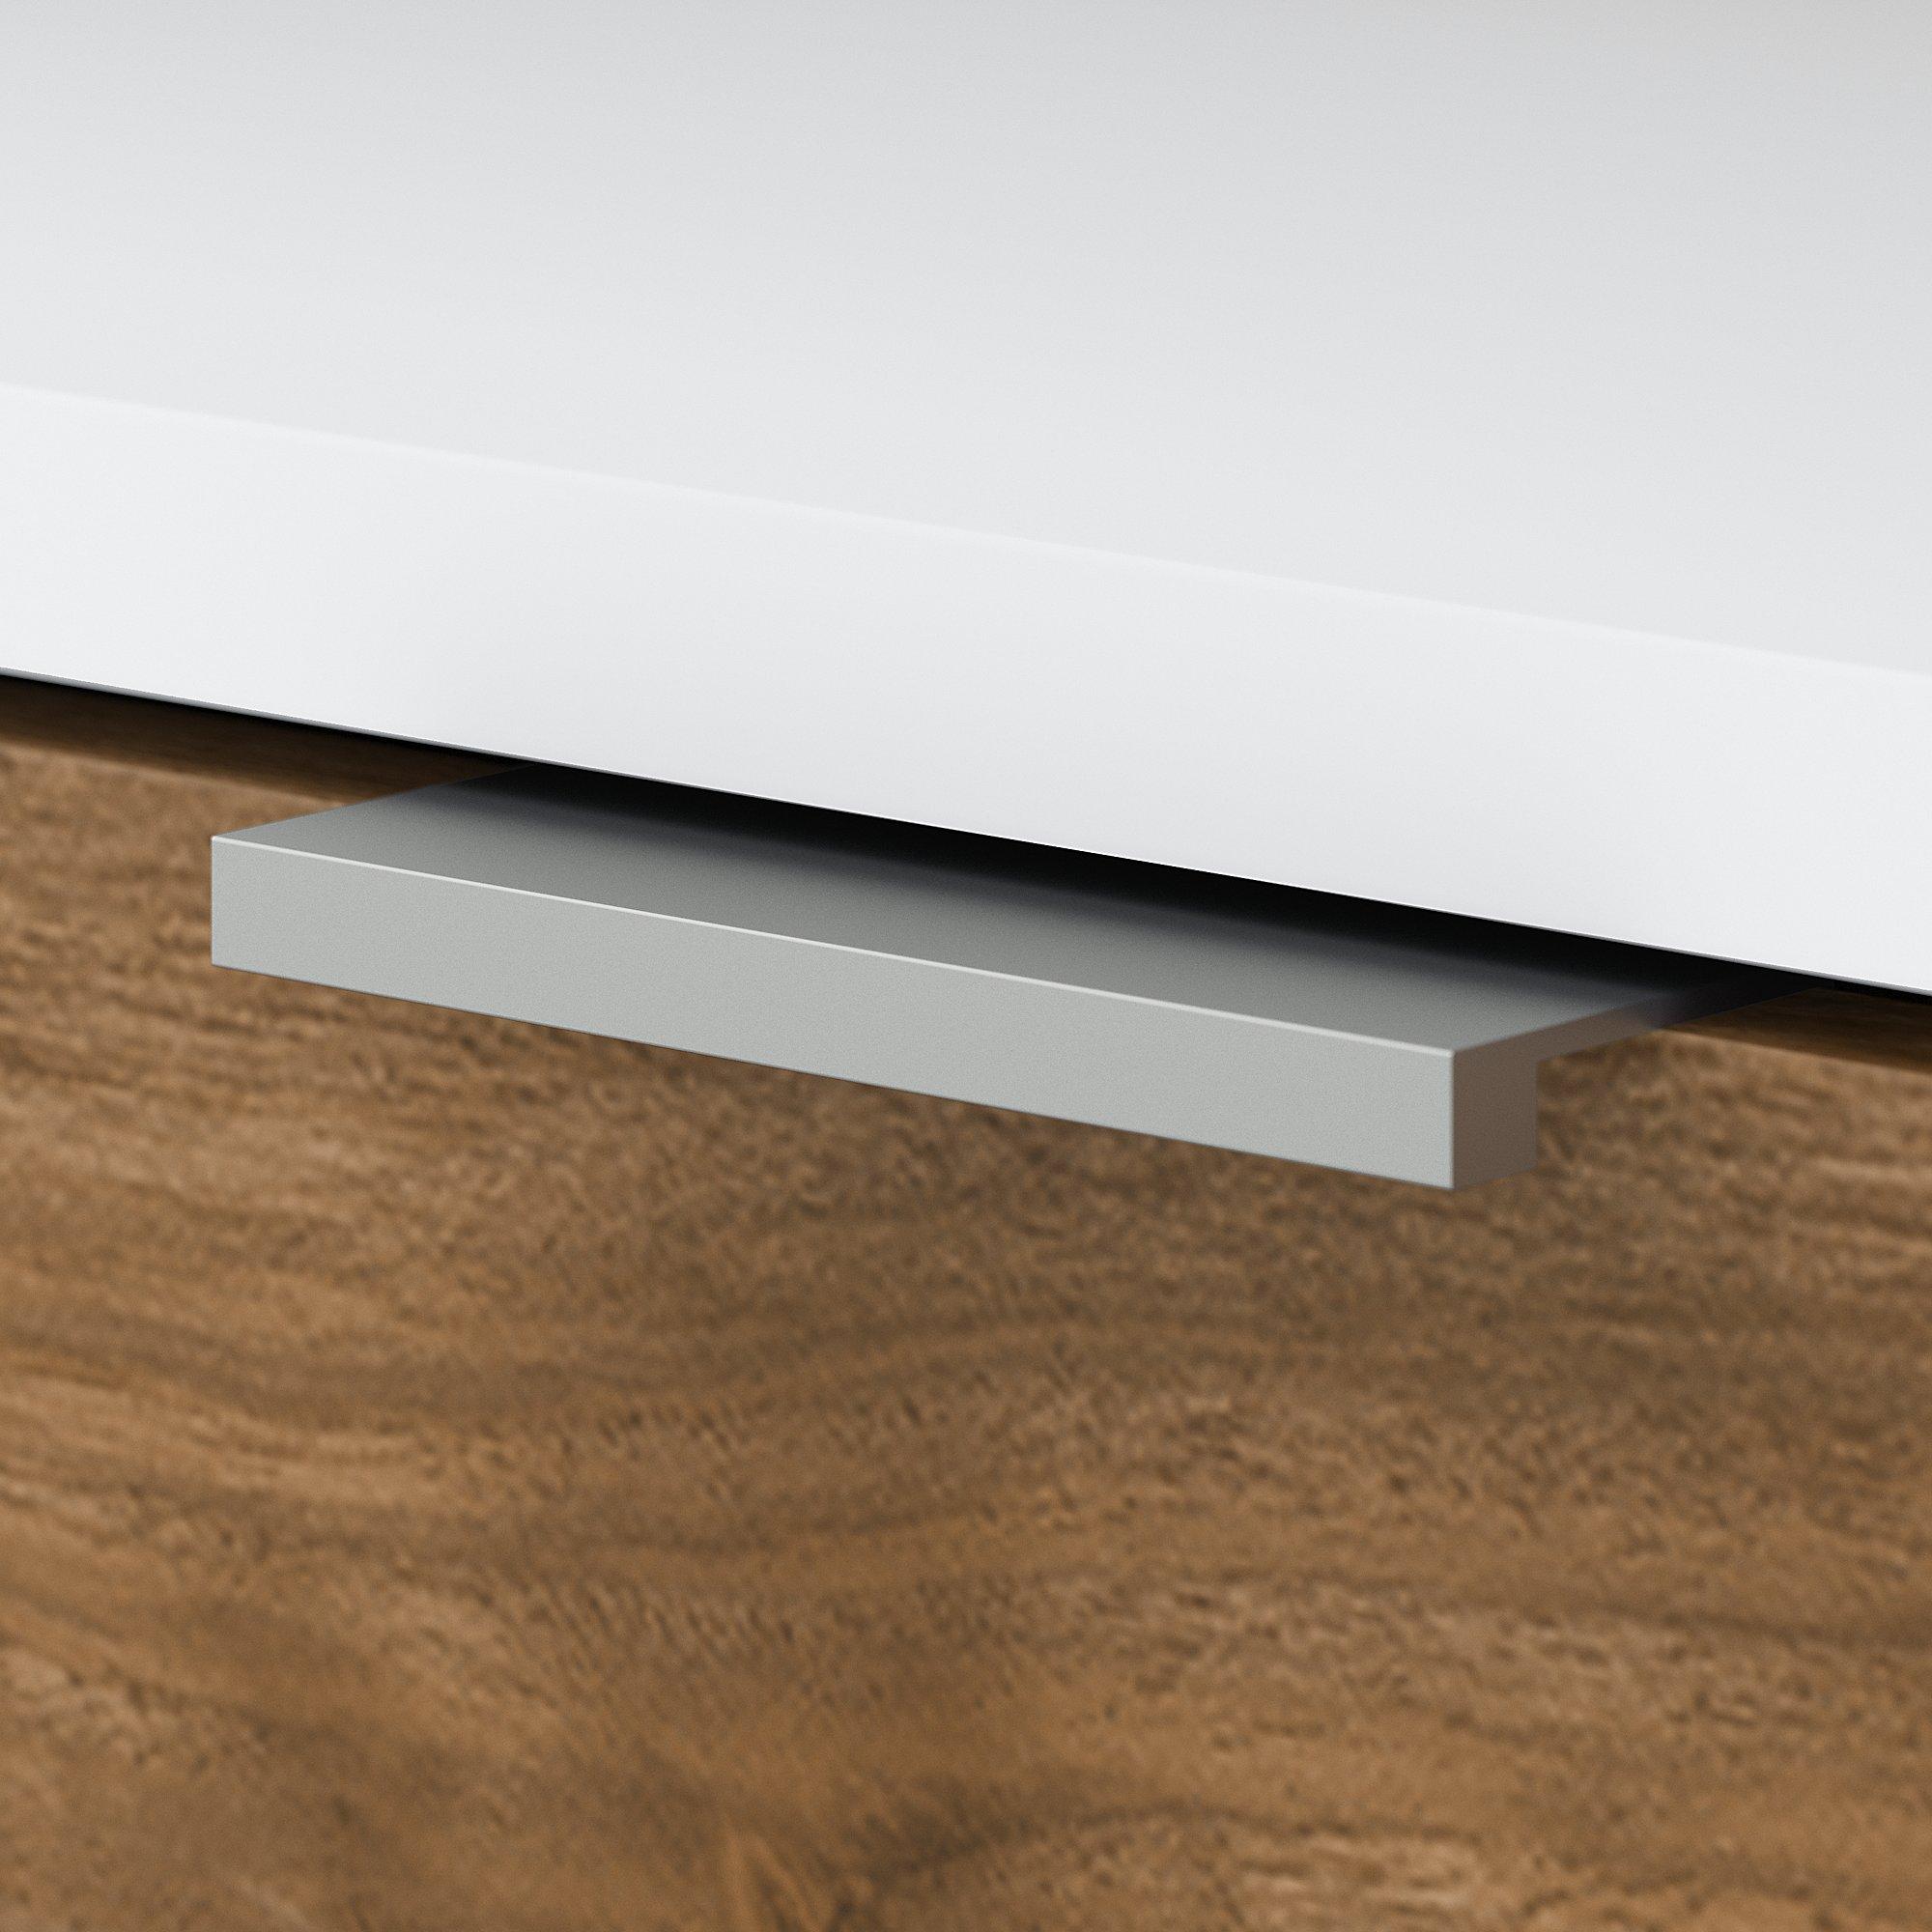 jamestown desk drawer handle